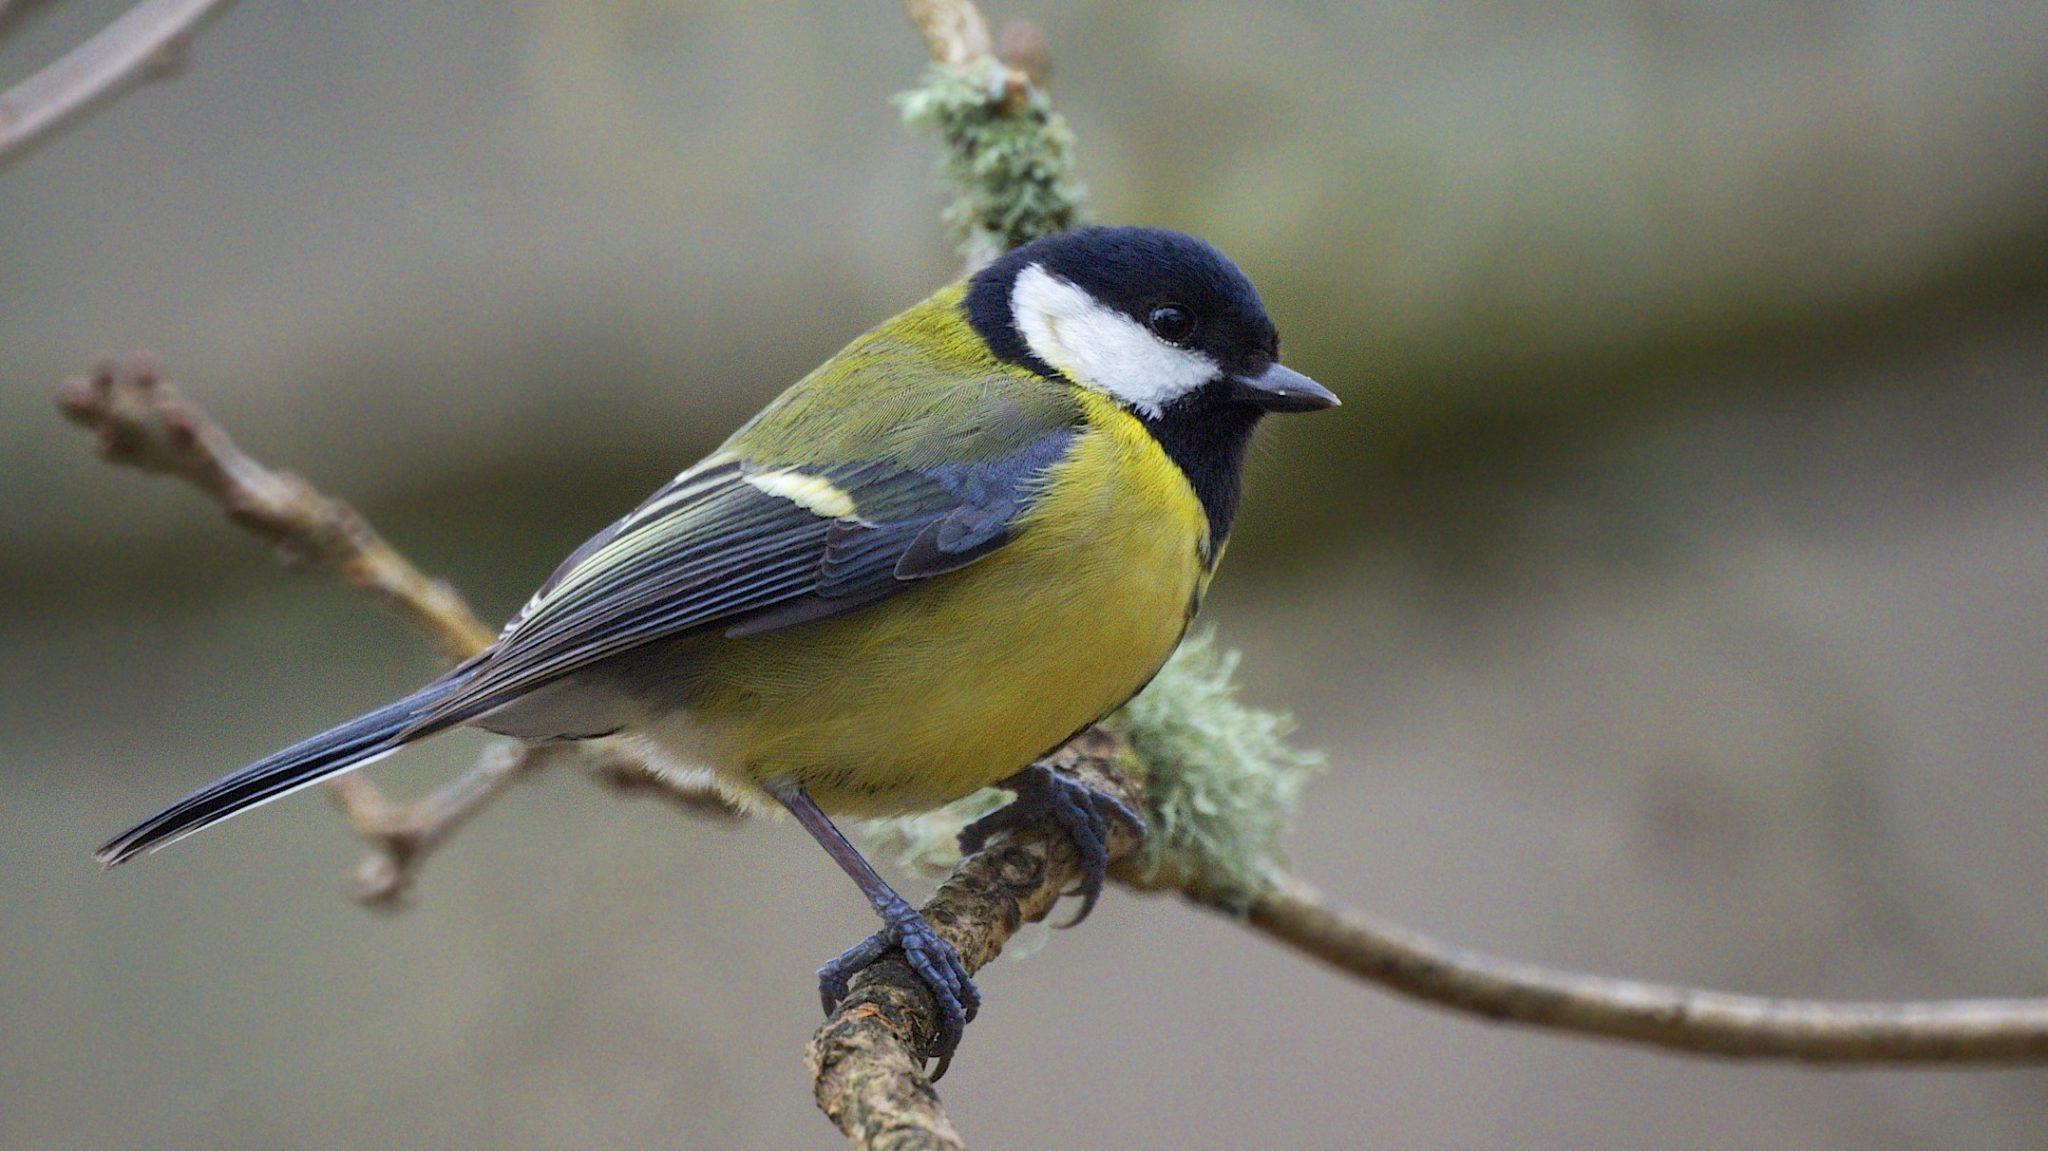 Are birdfeeders changing the shape of birds' beaks?